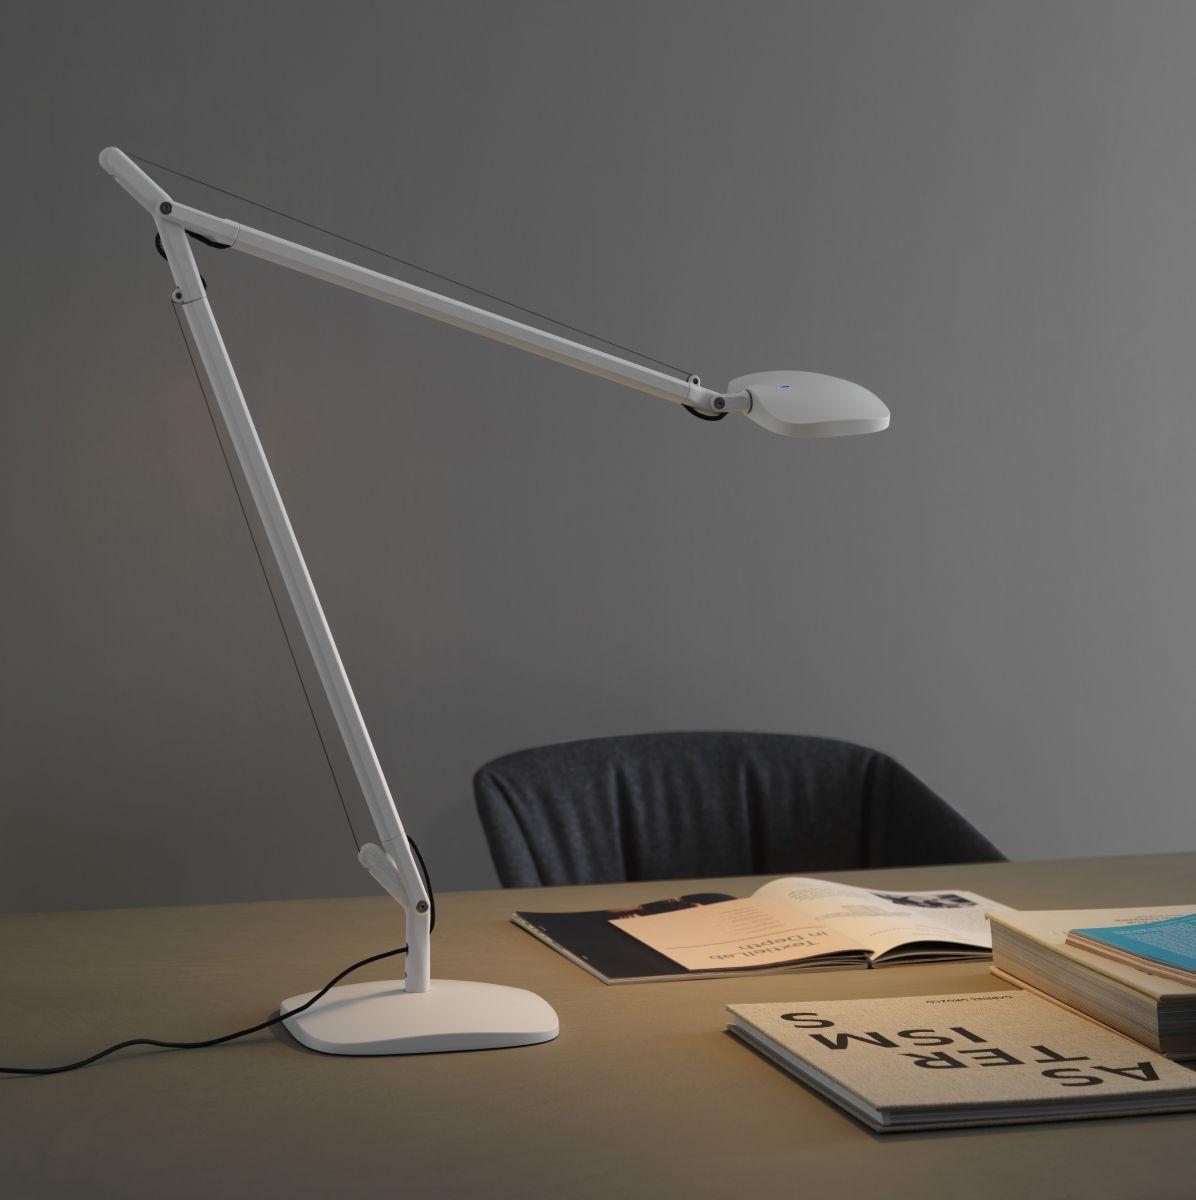 volee lampada scrivania fontana arte design illuminazione pavia